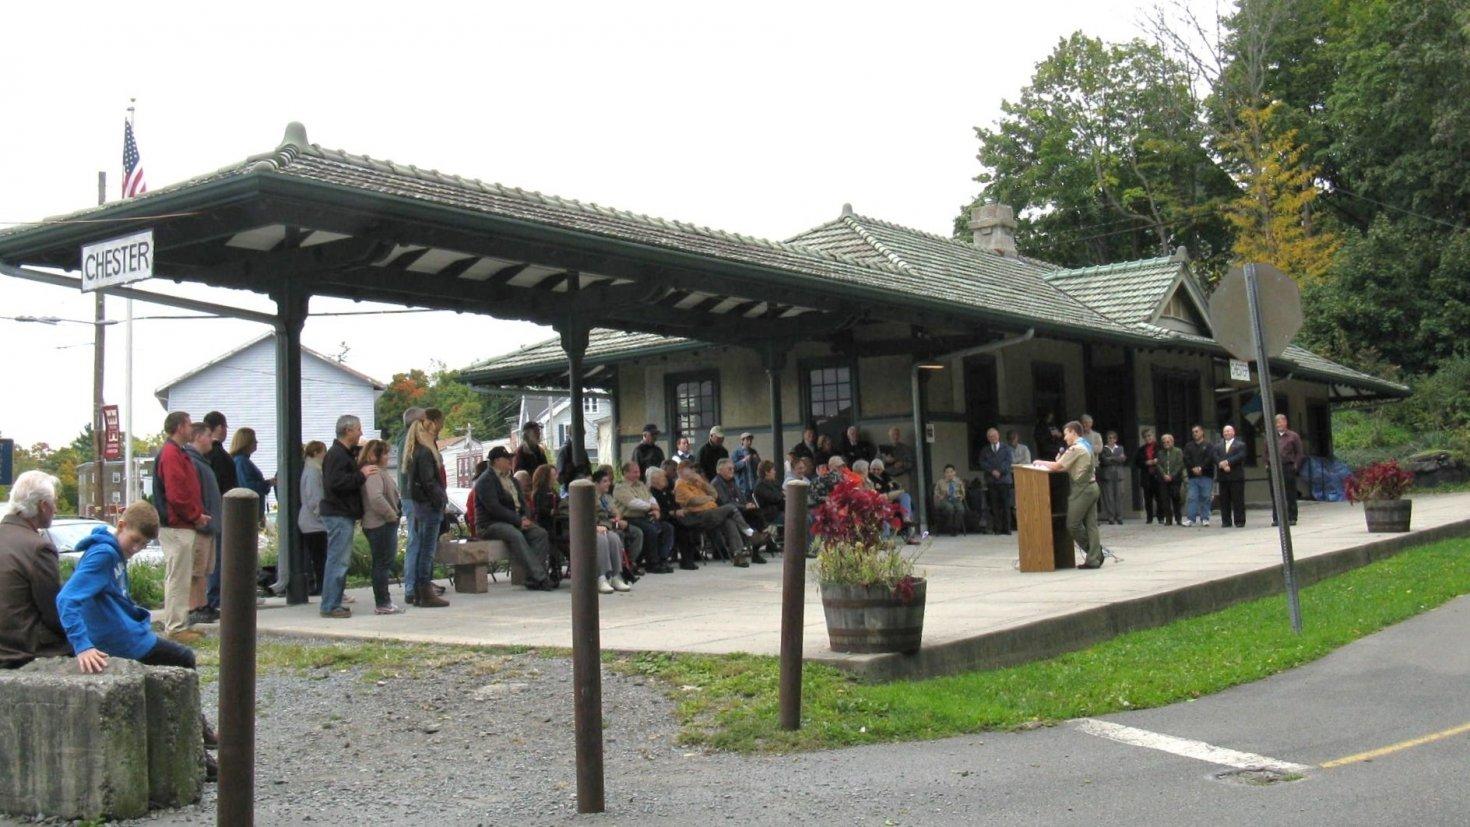 Chester Historical Society's 1915 Erie Depot